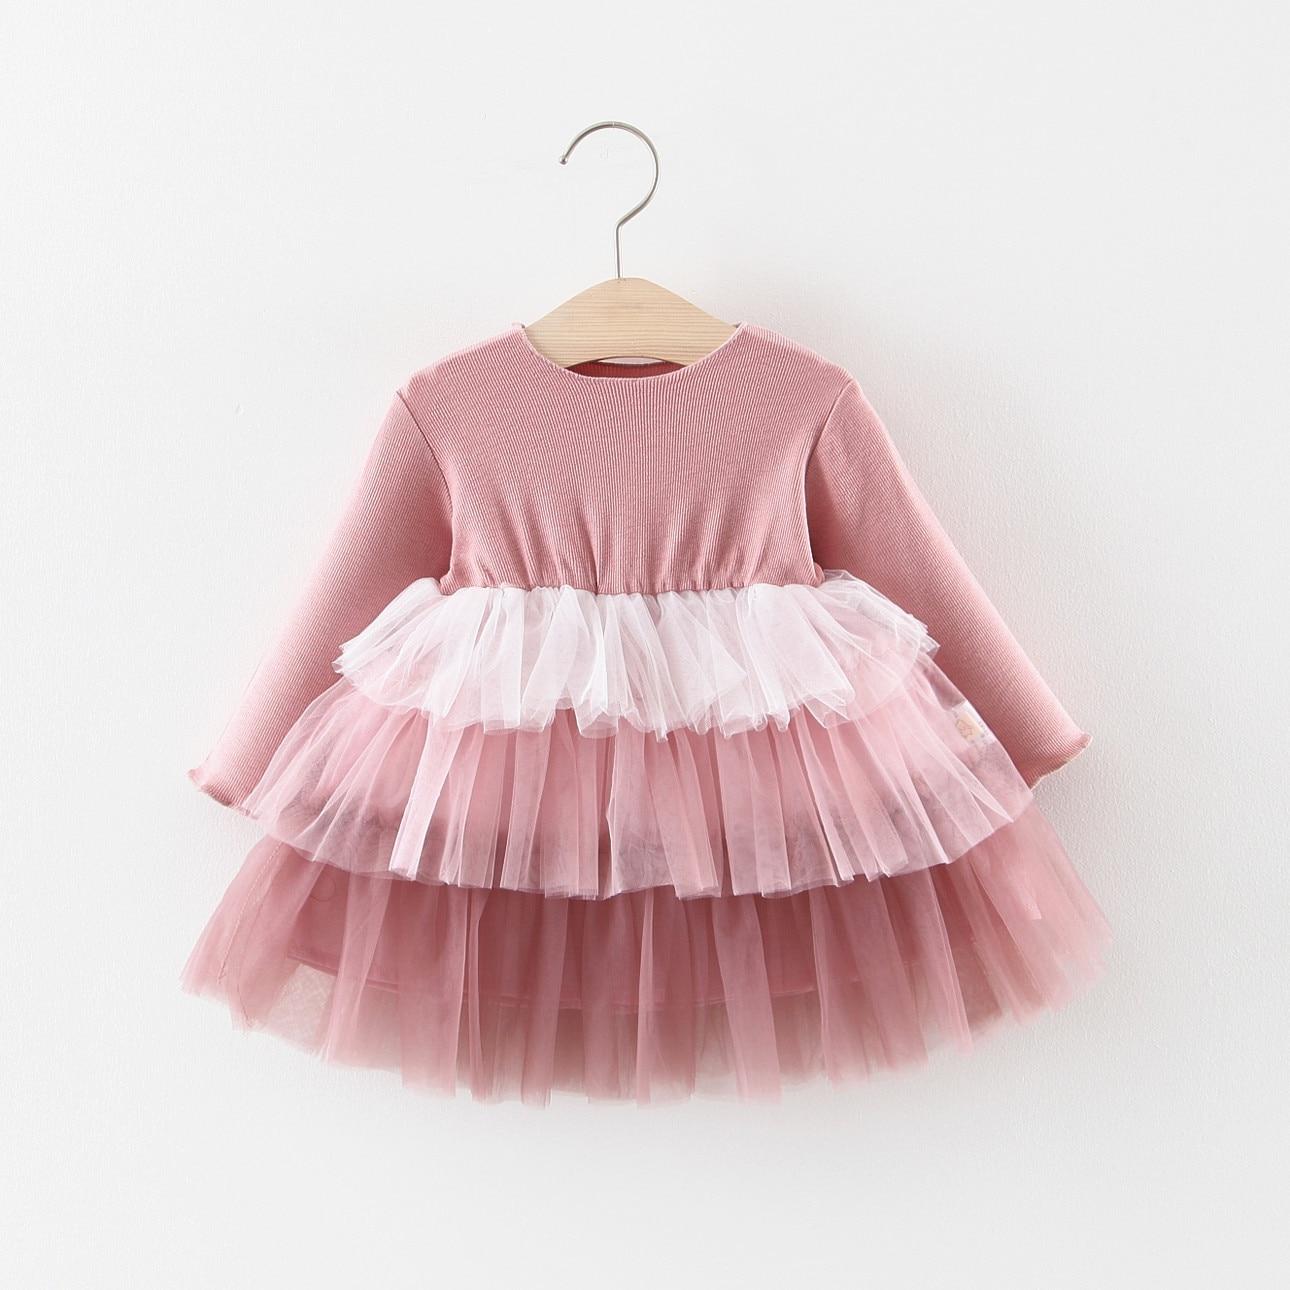 Party Dress Girls Clothing Long-Sleeve Cotton Fashion Children